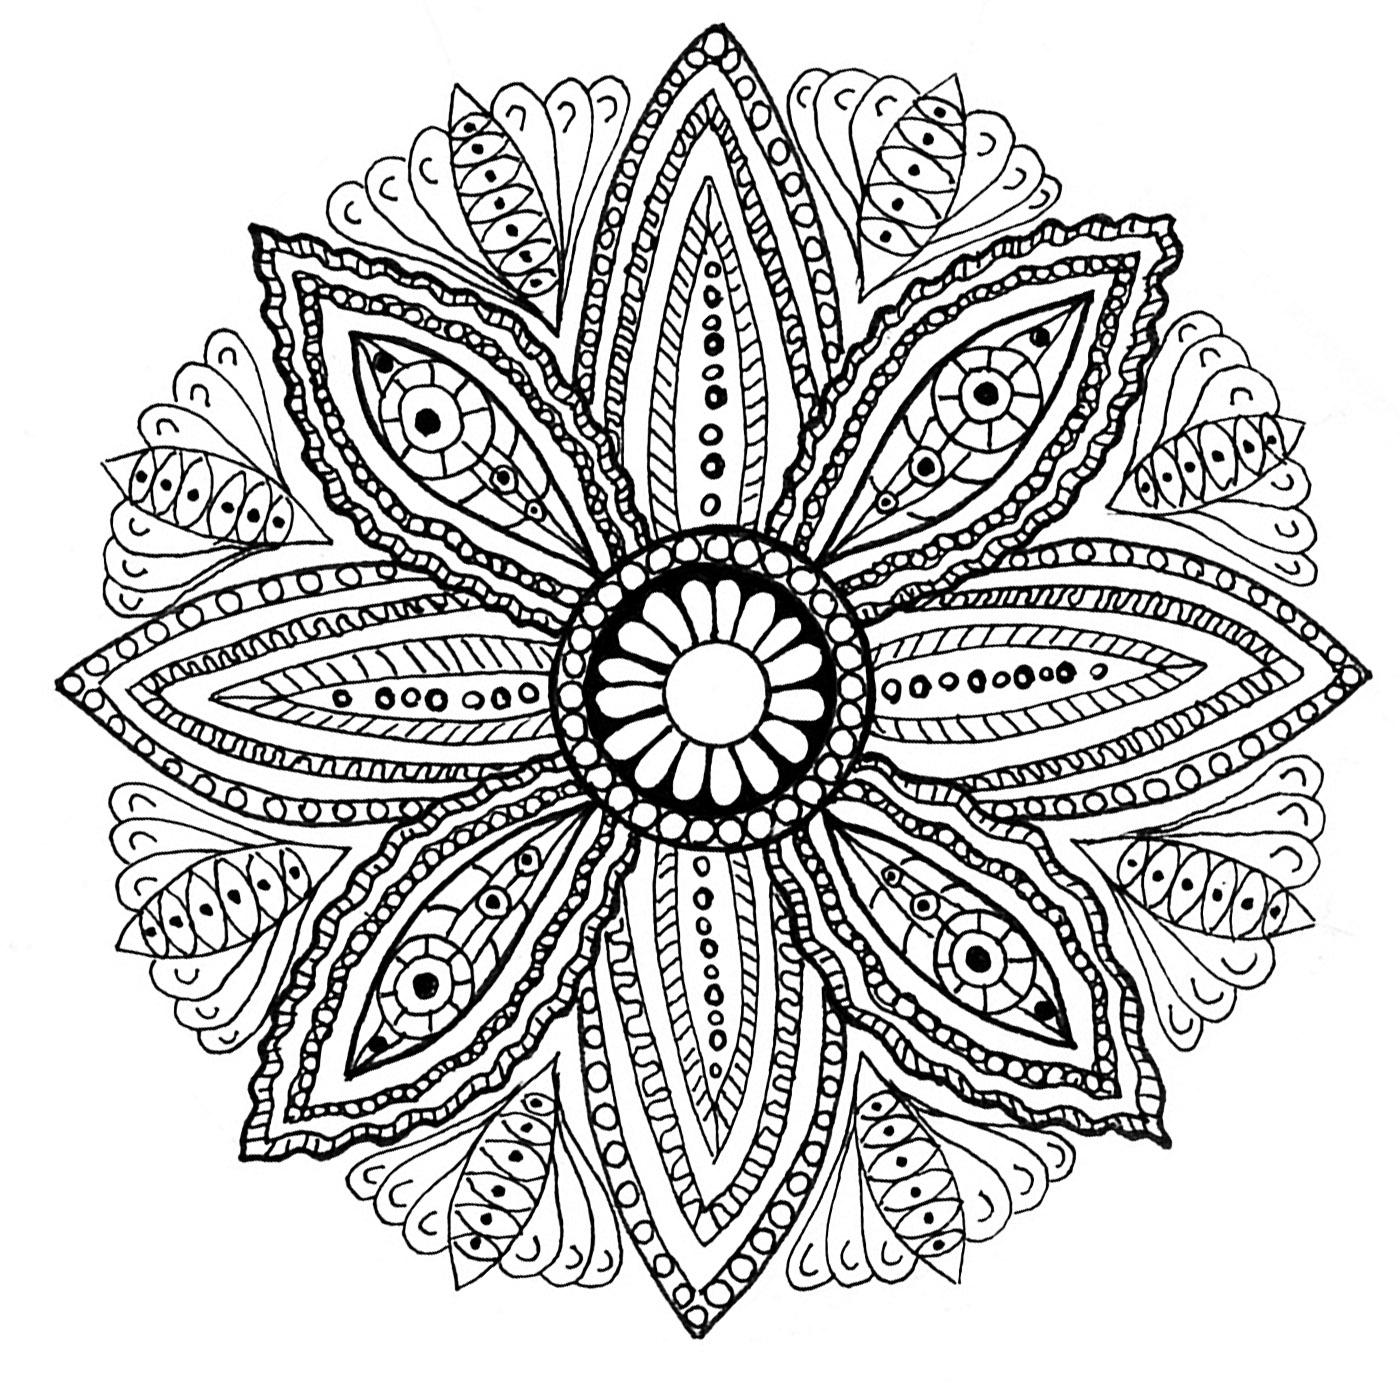 Mandalas Coloring Pages For Adults Coloring Mandala Leaves